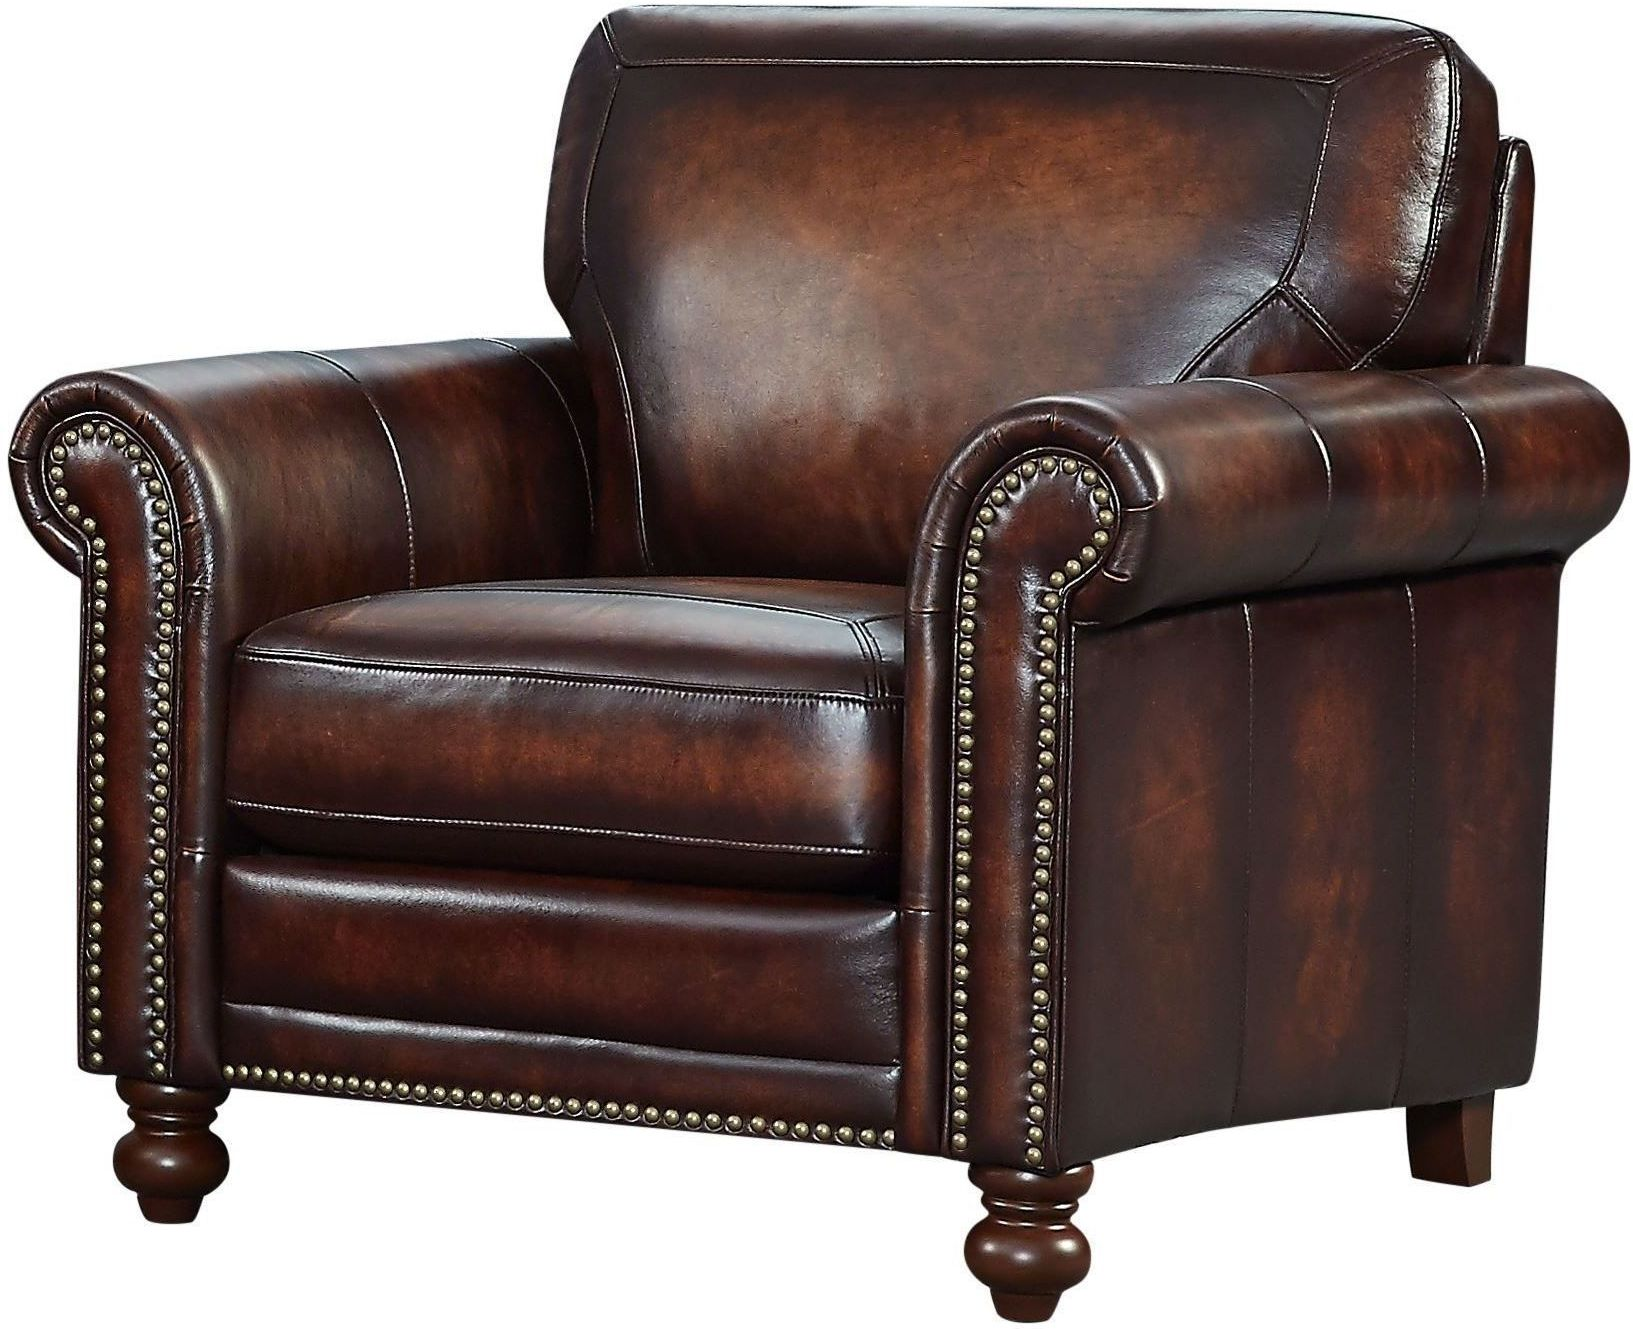 leather italia usa westport hampton brown chair   westport